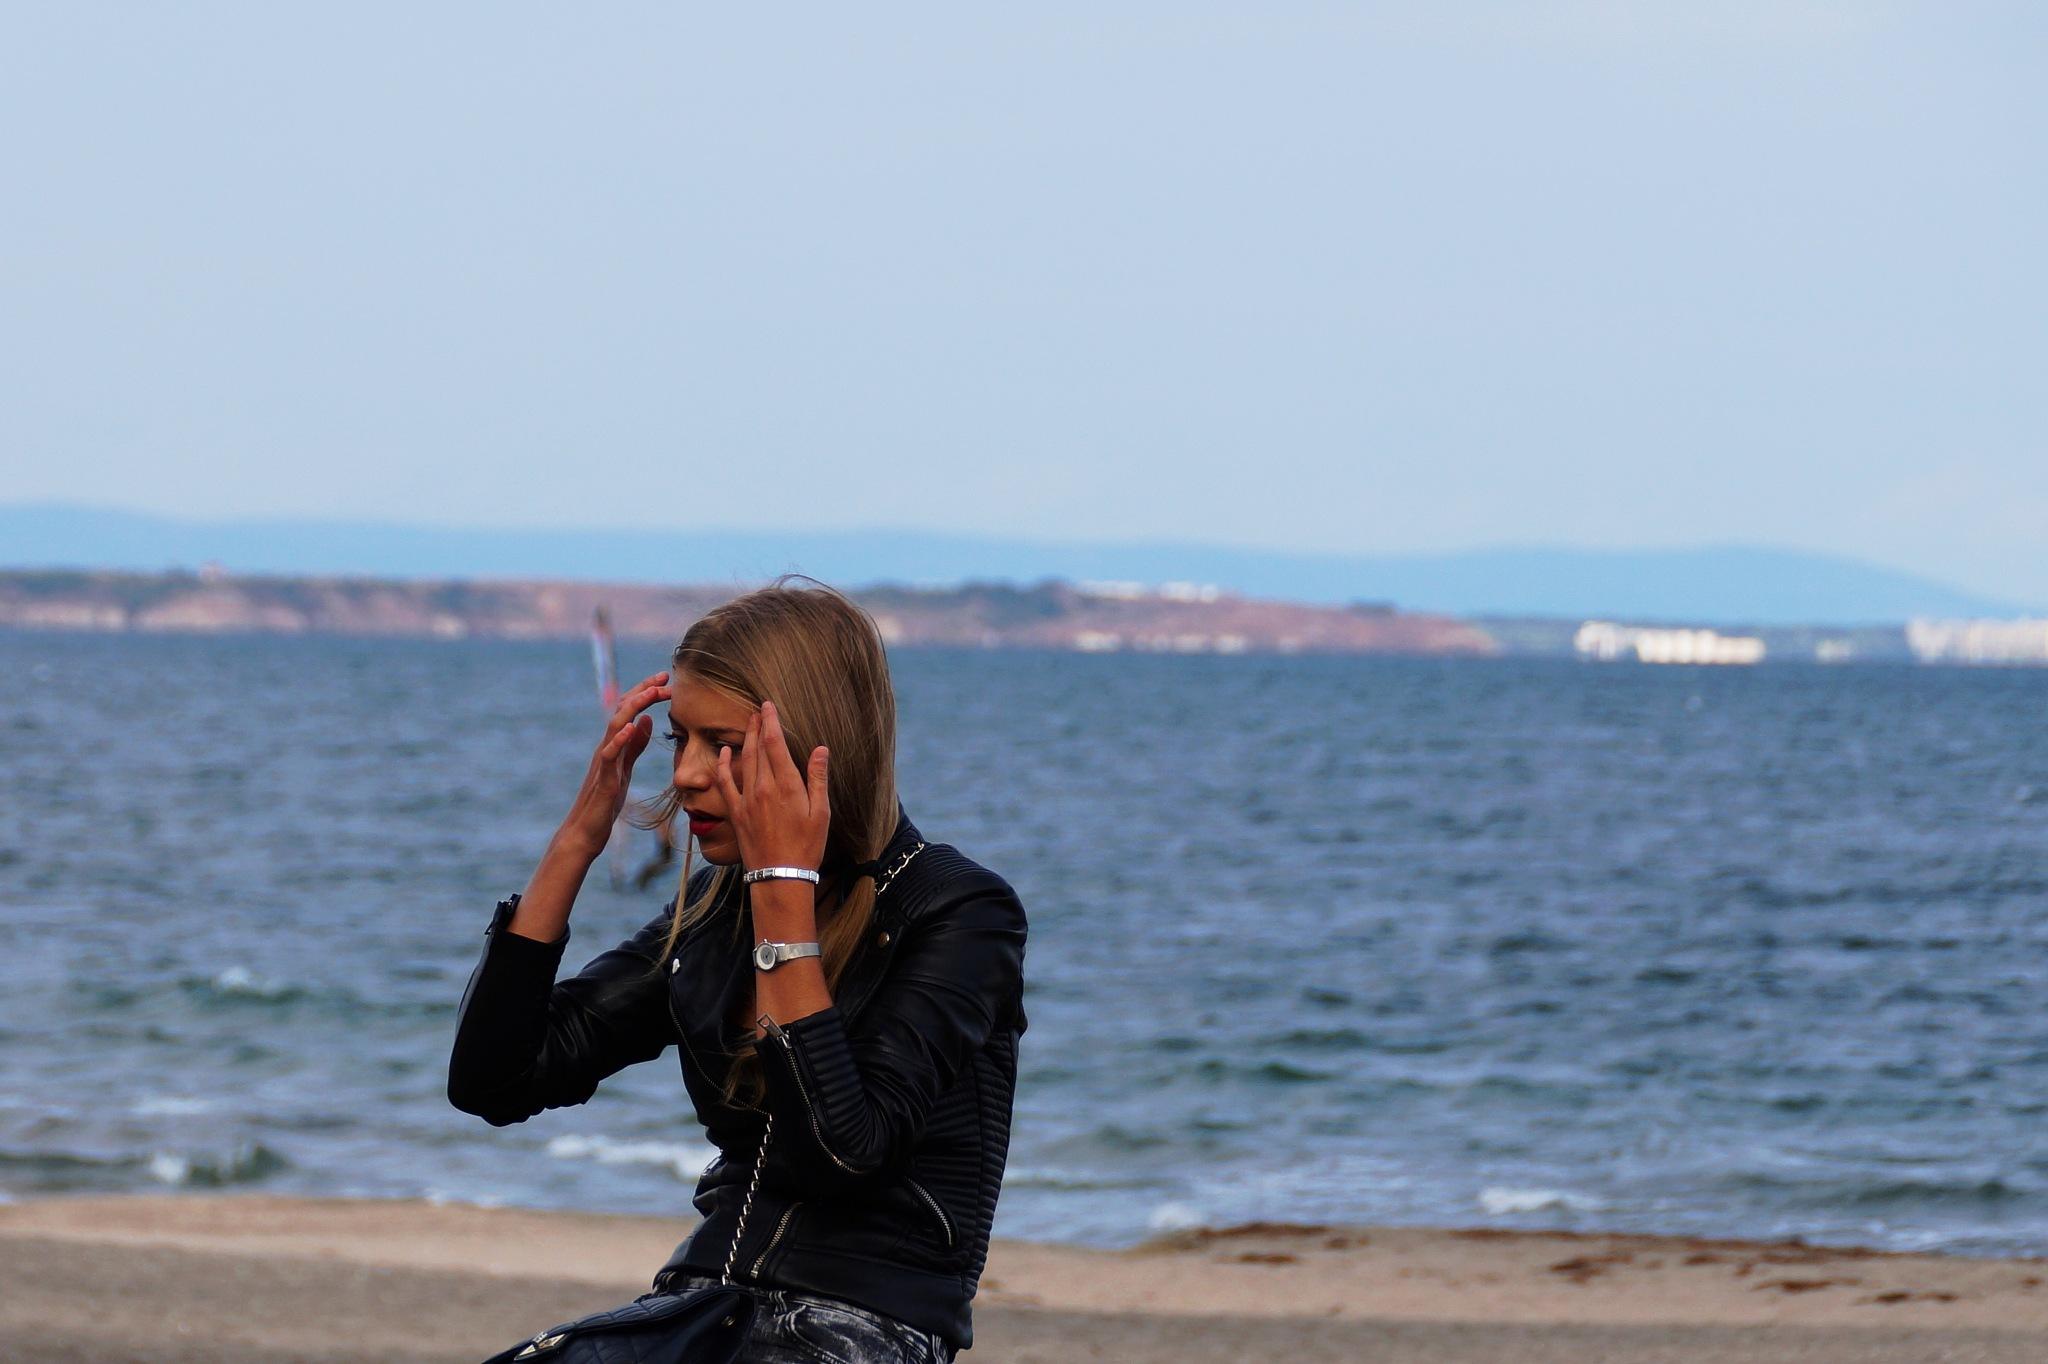 Beauty on the beach by libol